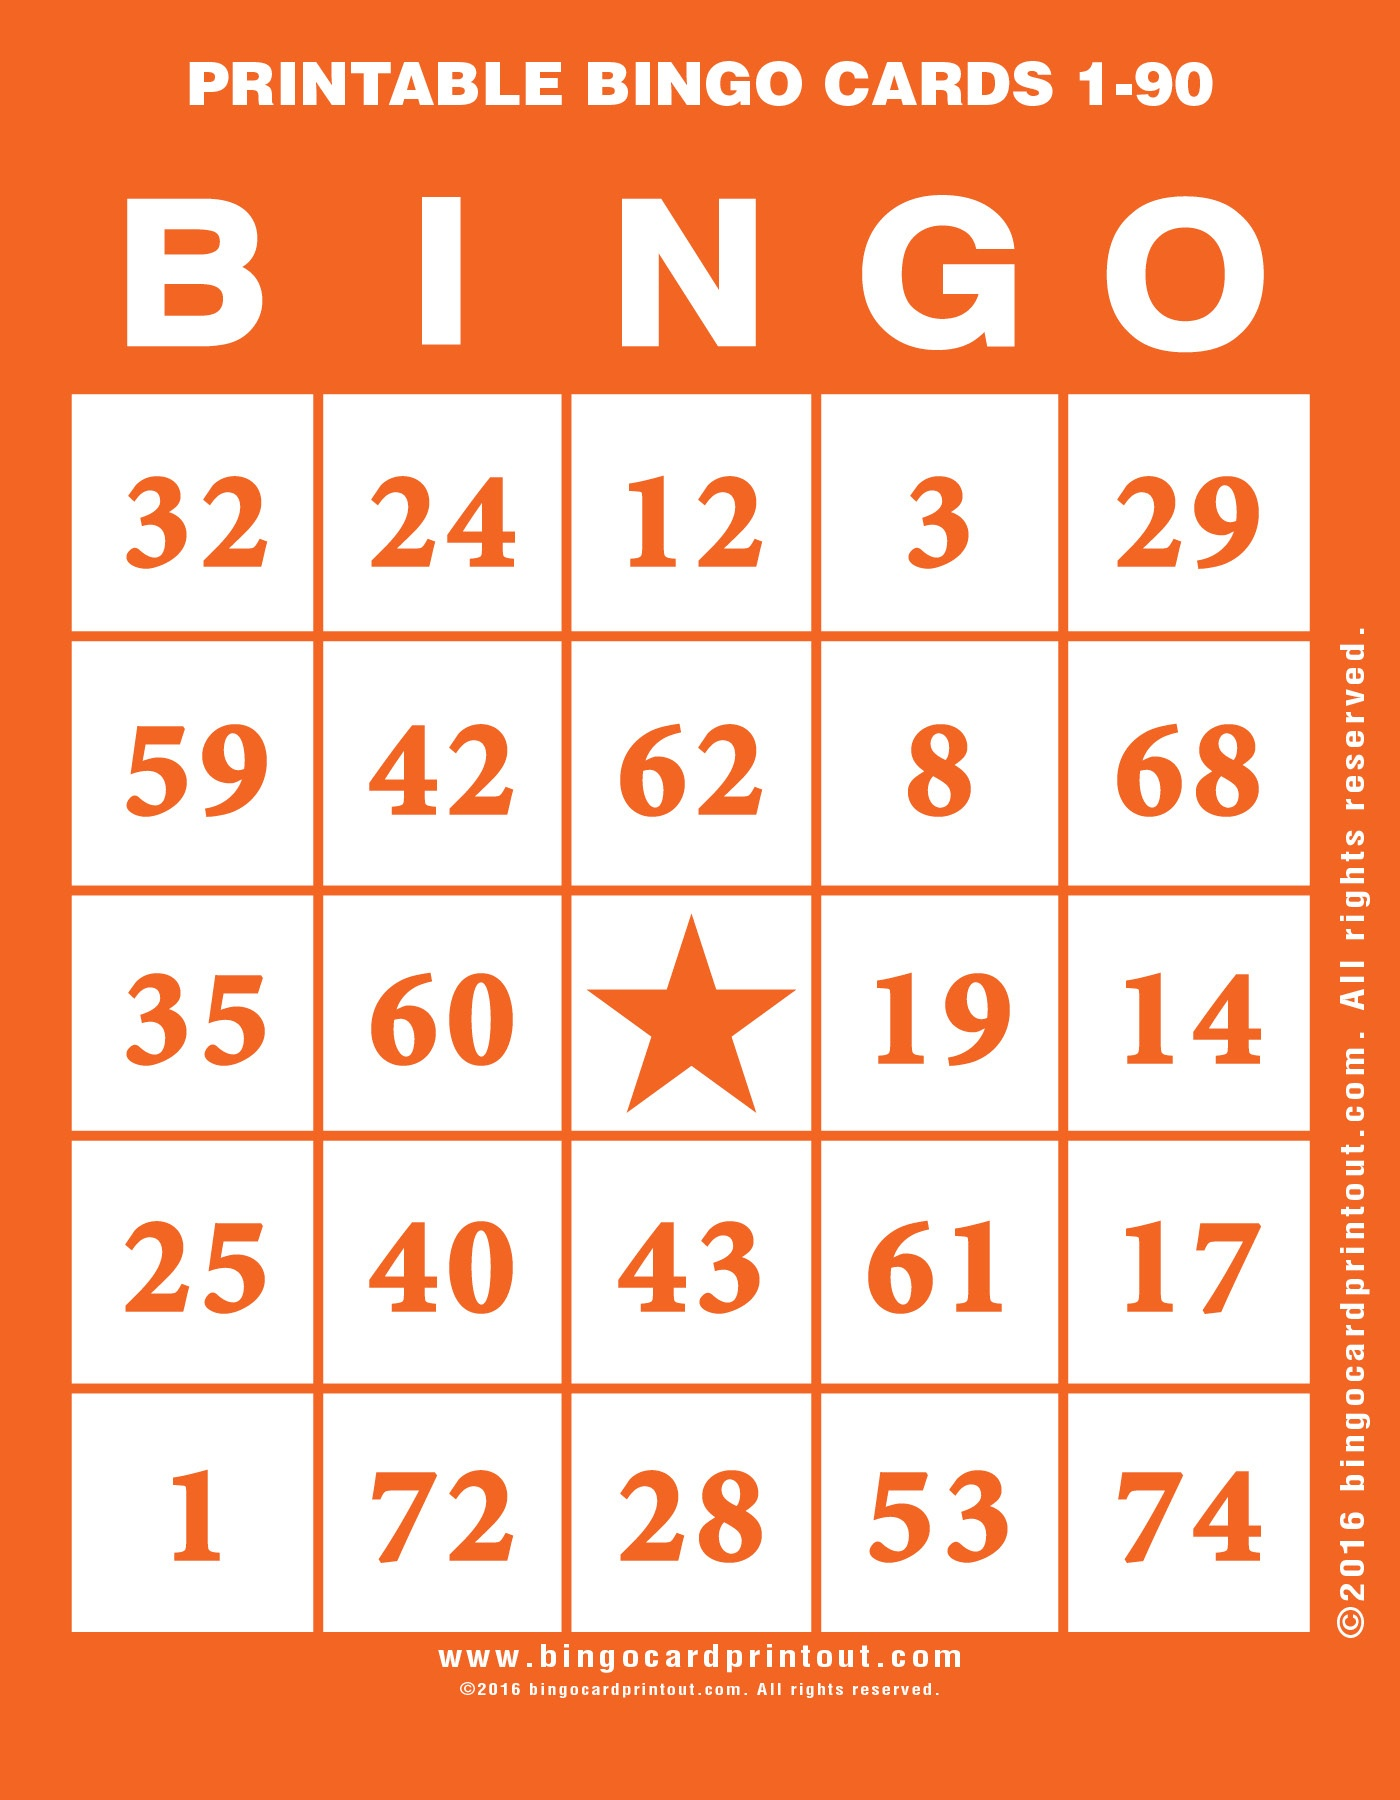 Printable Bingo Cards 1-90 - Bingocardprintout - Free Printable Number Bingo Cards 1 20